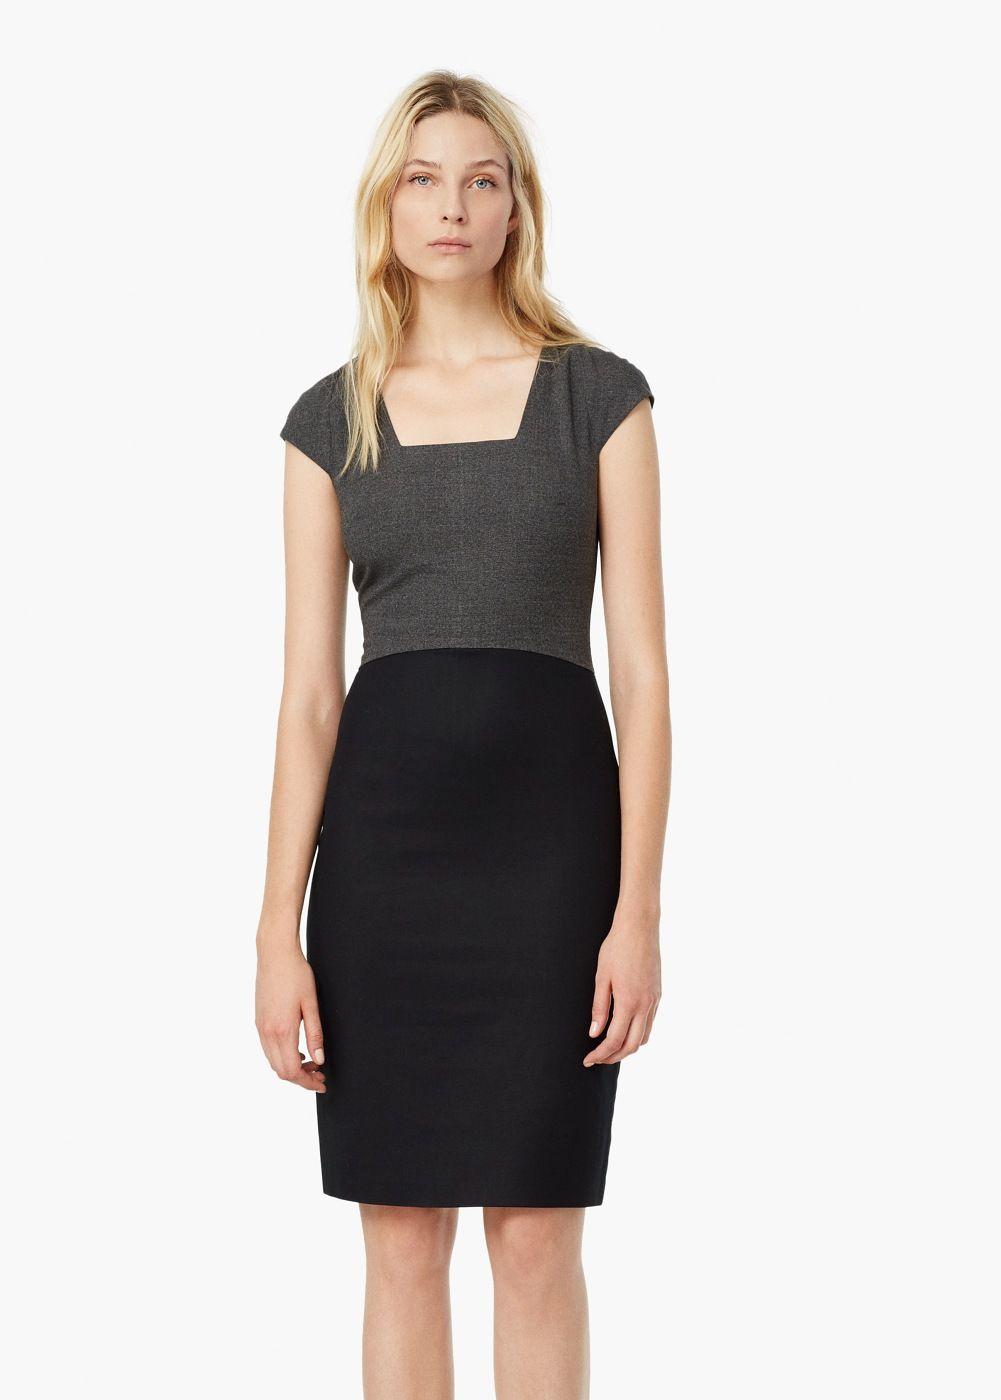 54b206c2df1e Contrast skirt dress - Dresses for Women